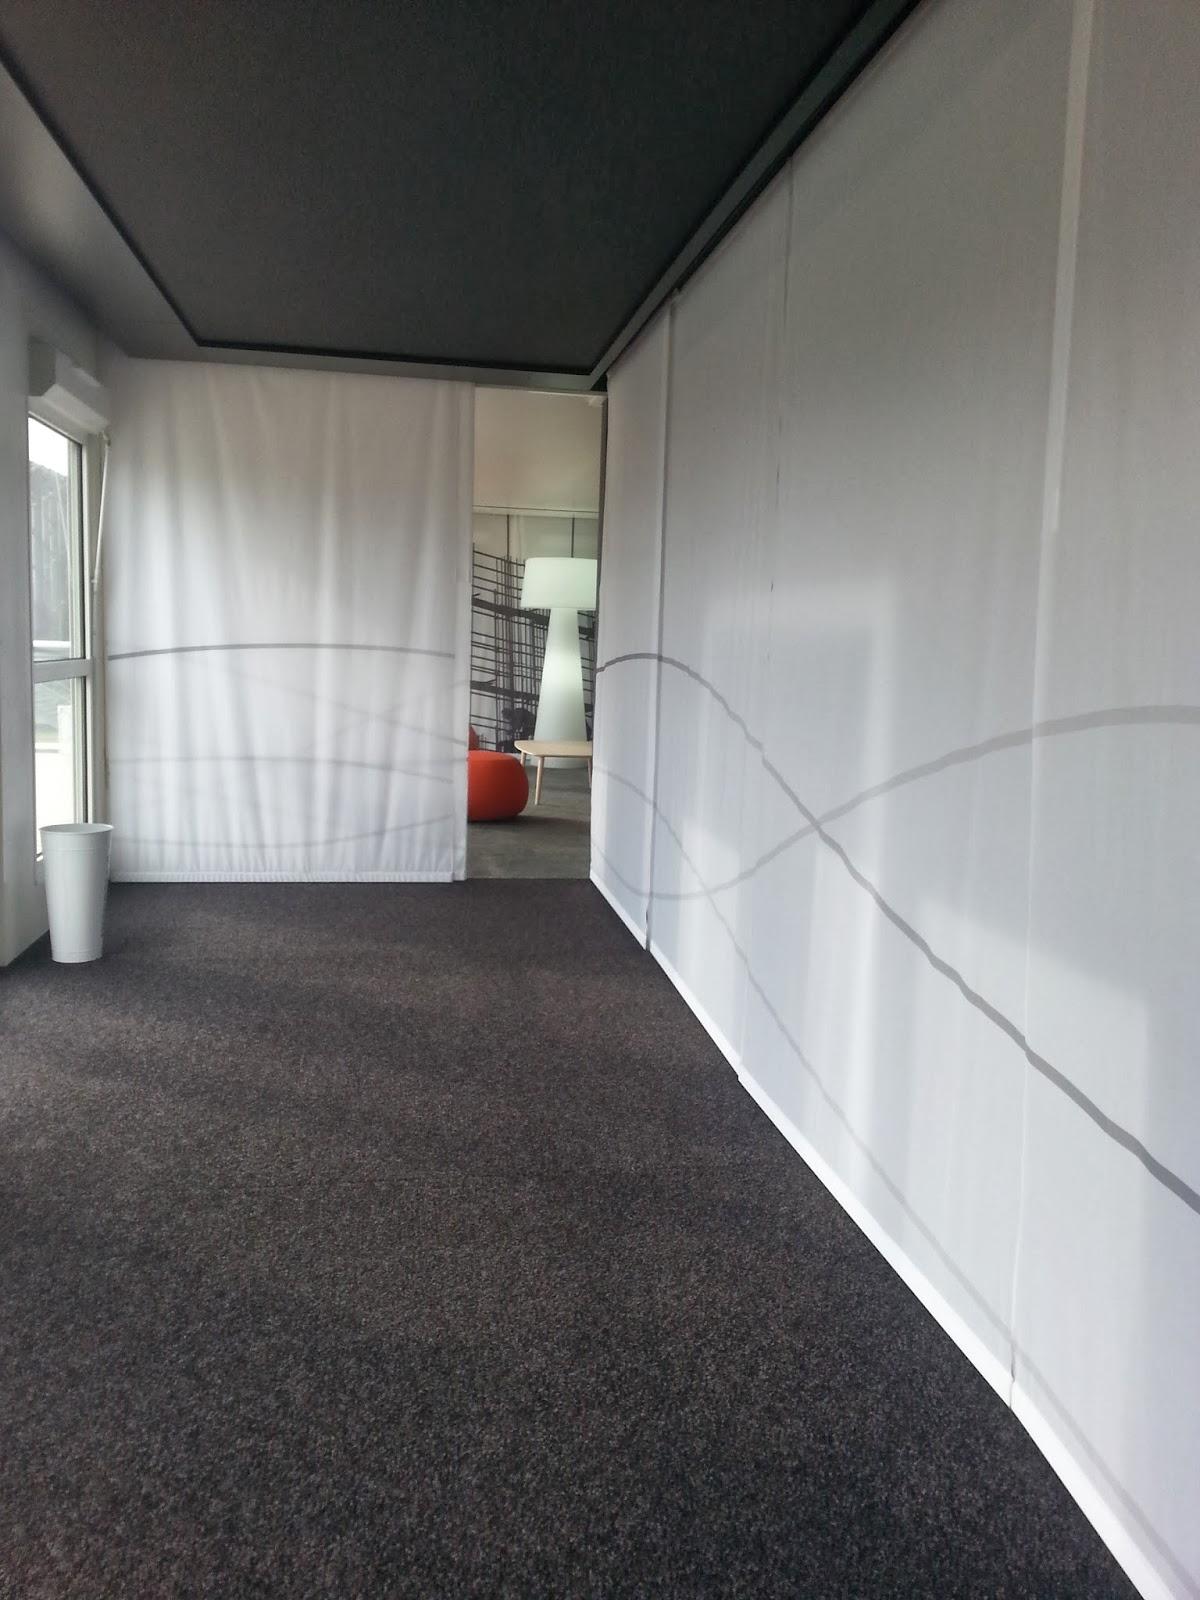 agence d 39 architecture int rieure parallel paris centre commercial polygone riviera. Black Bedroom Furniture Sets. Home Design Ideas